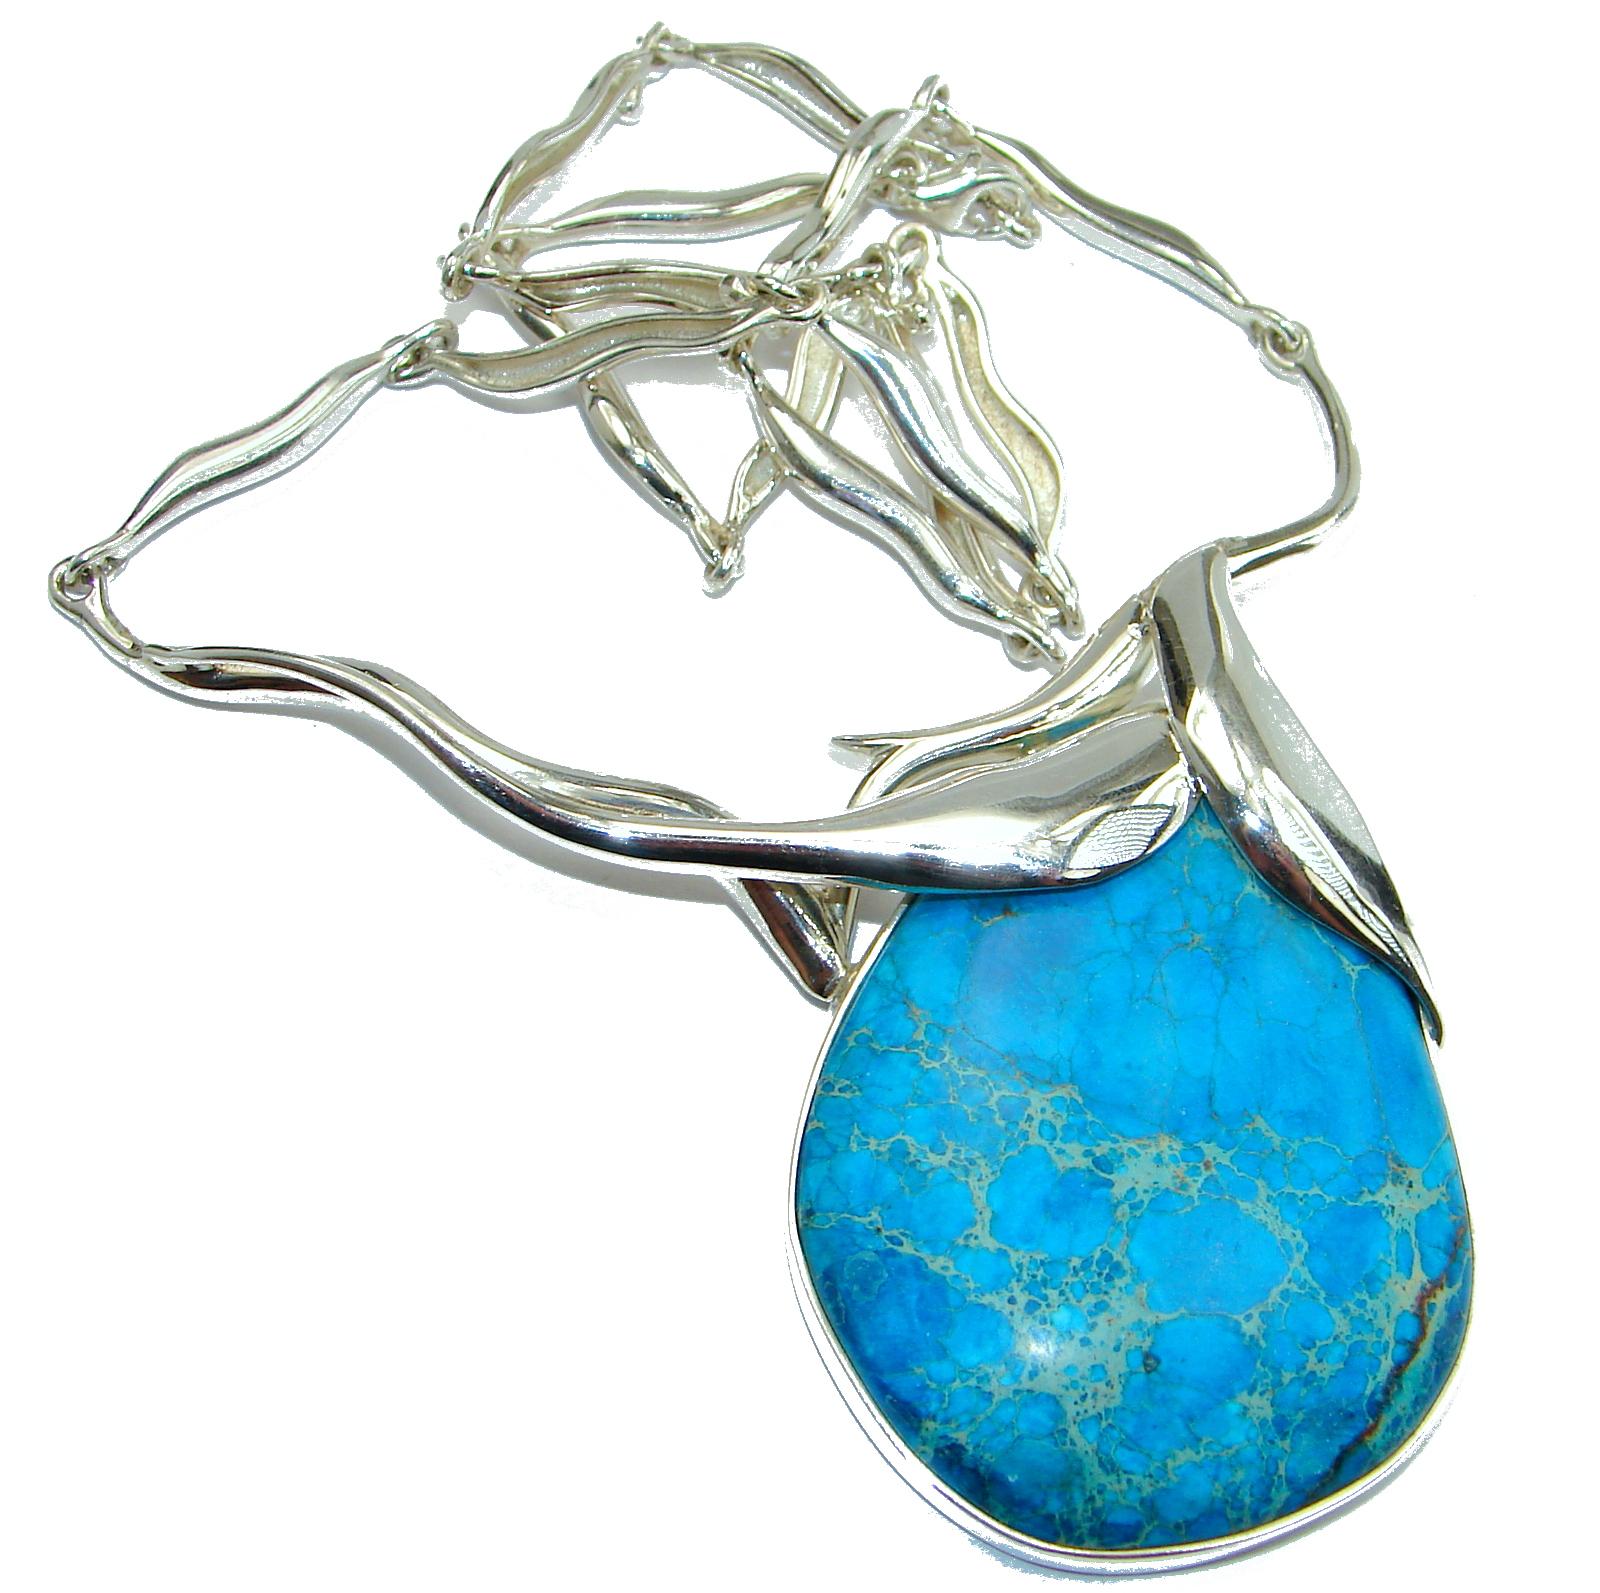 Julietta Blue Sea Sediment Jasper oxidized .925 Sterling Silver handmade necklace